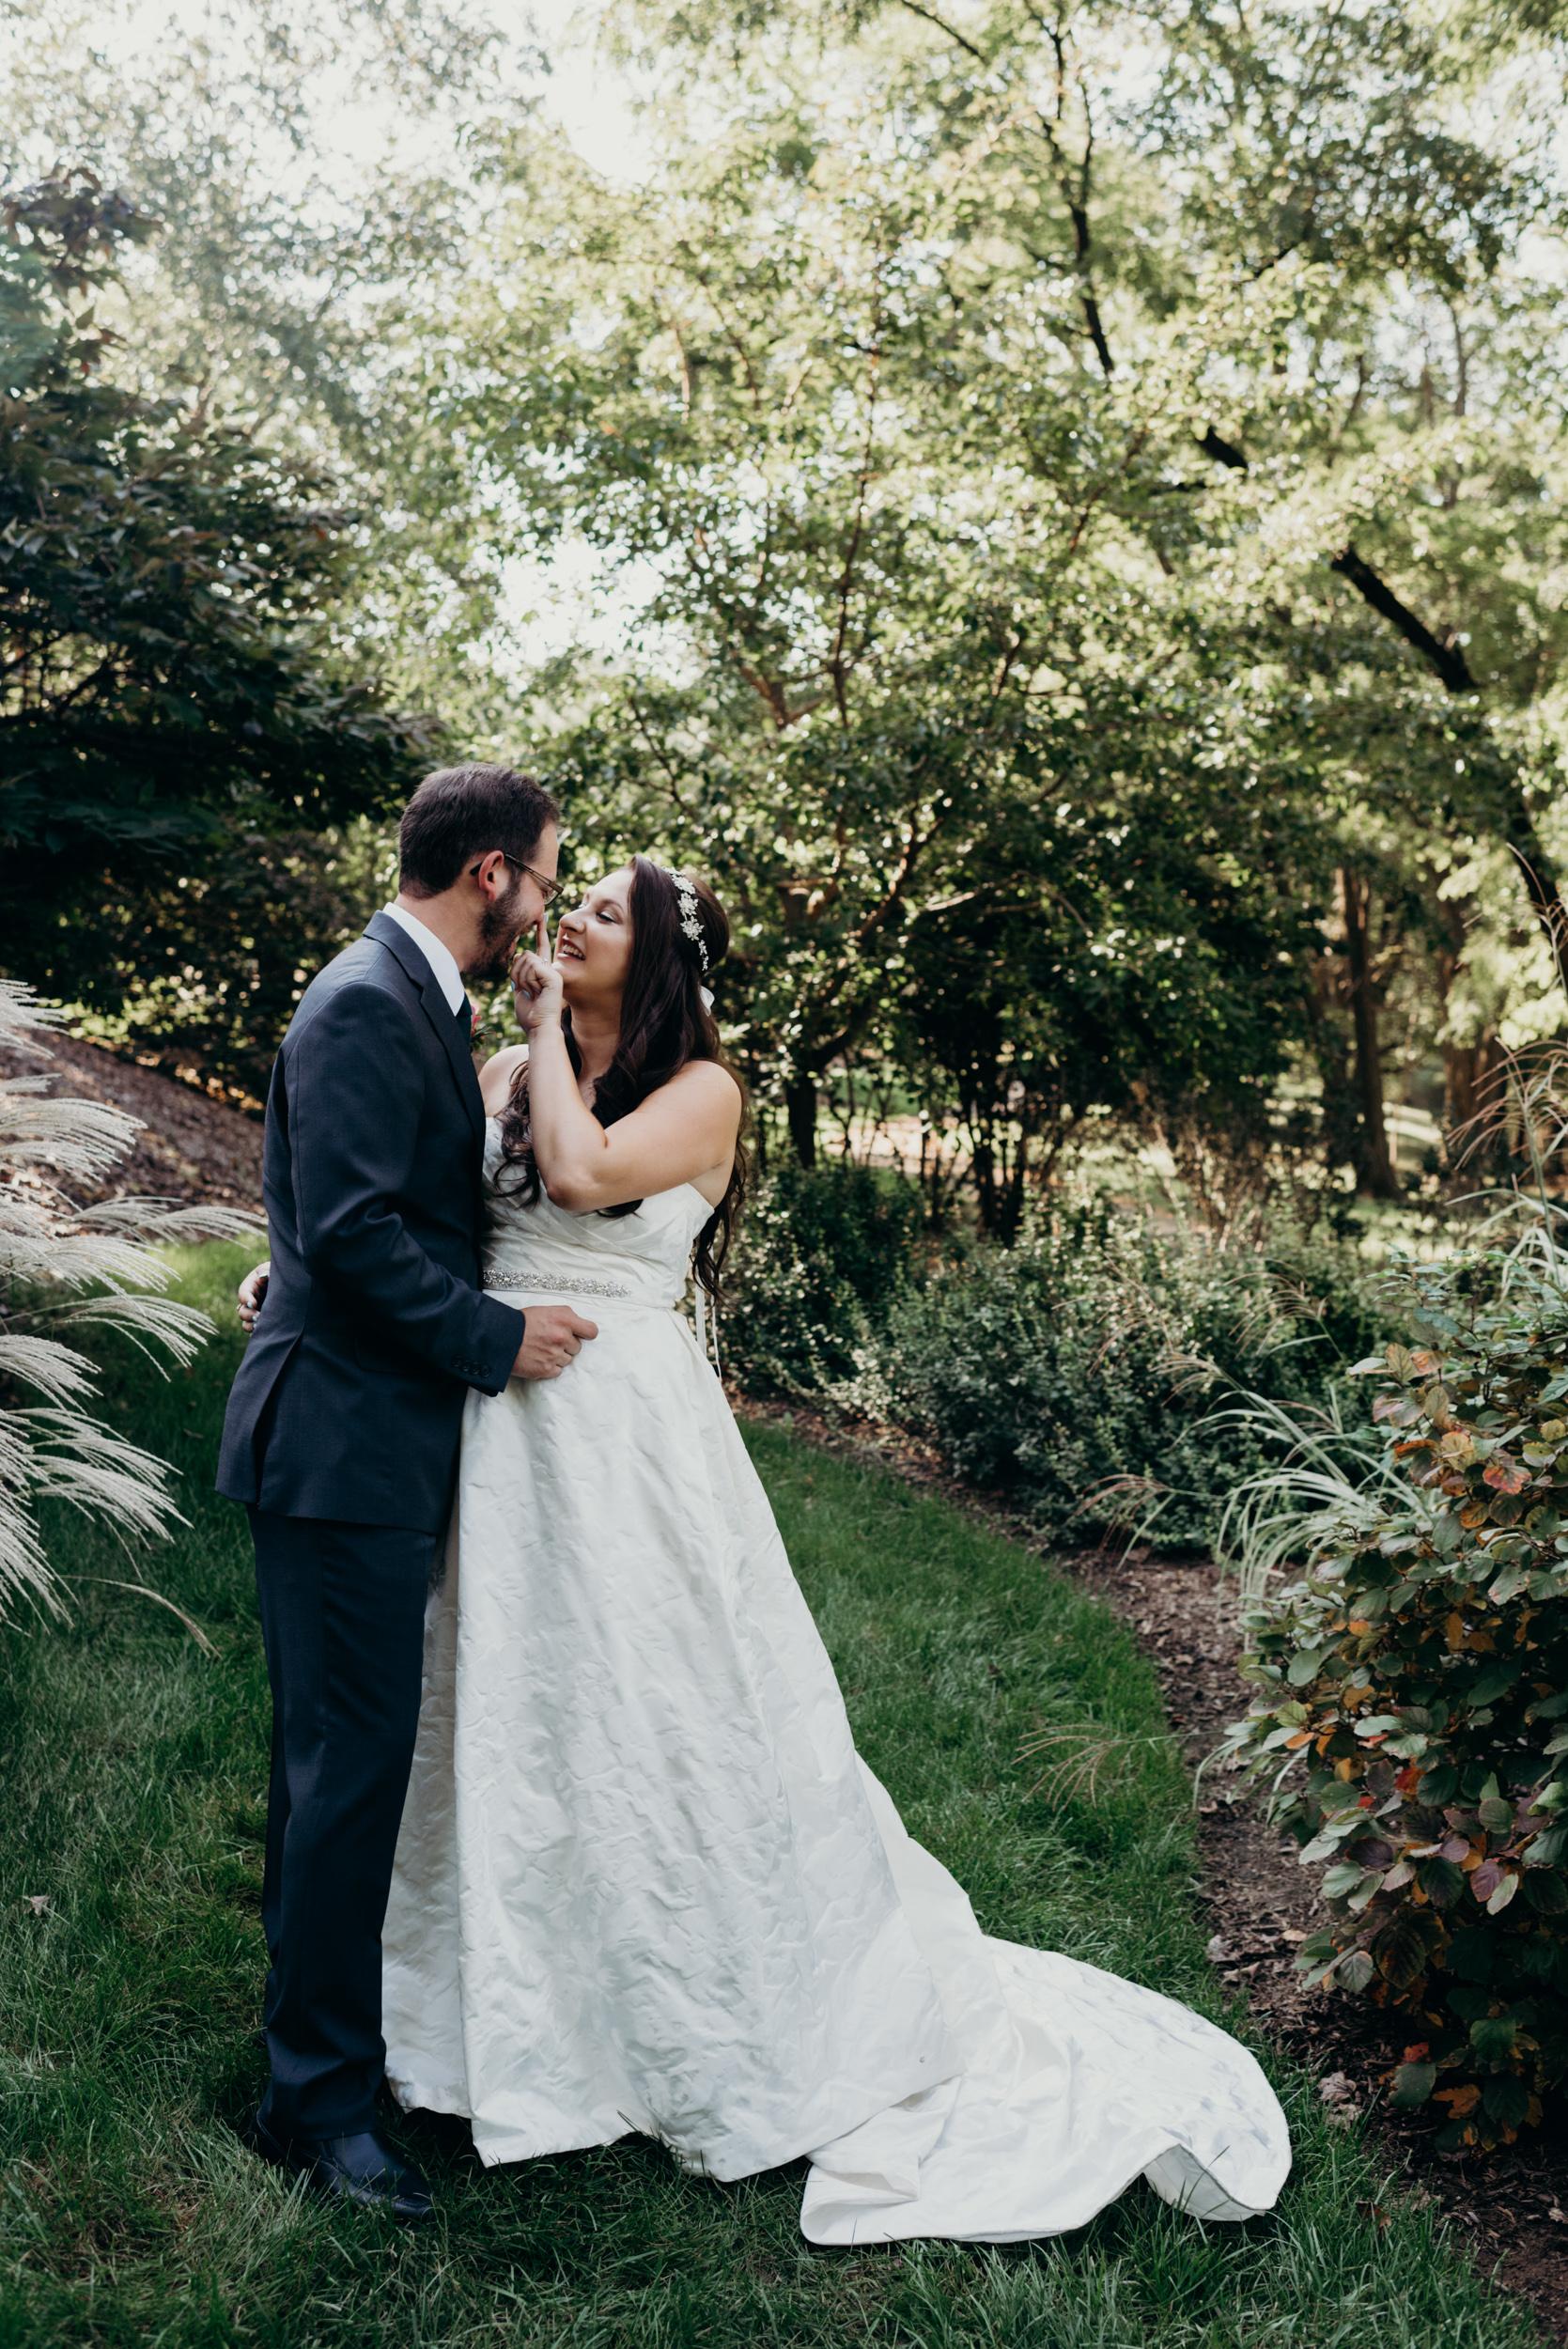 dc-intimate-wedding-photographer-megan-graham-photography